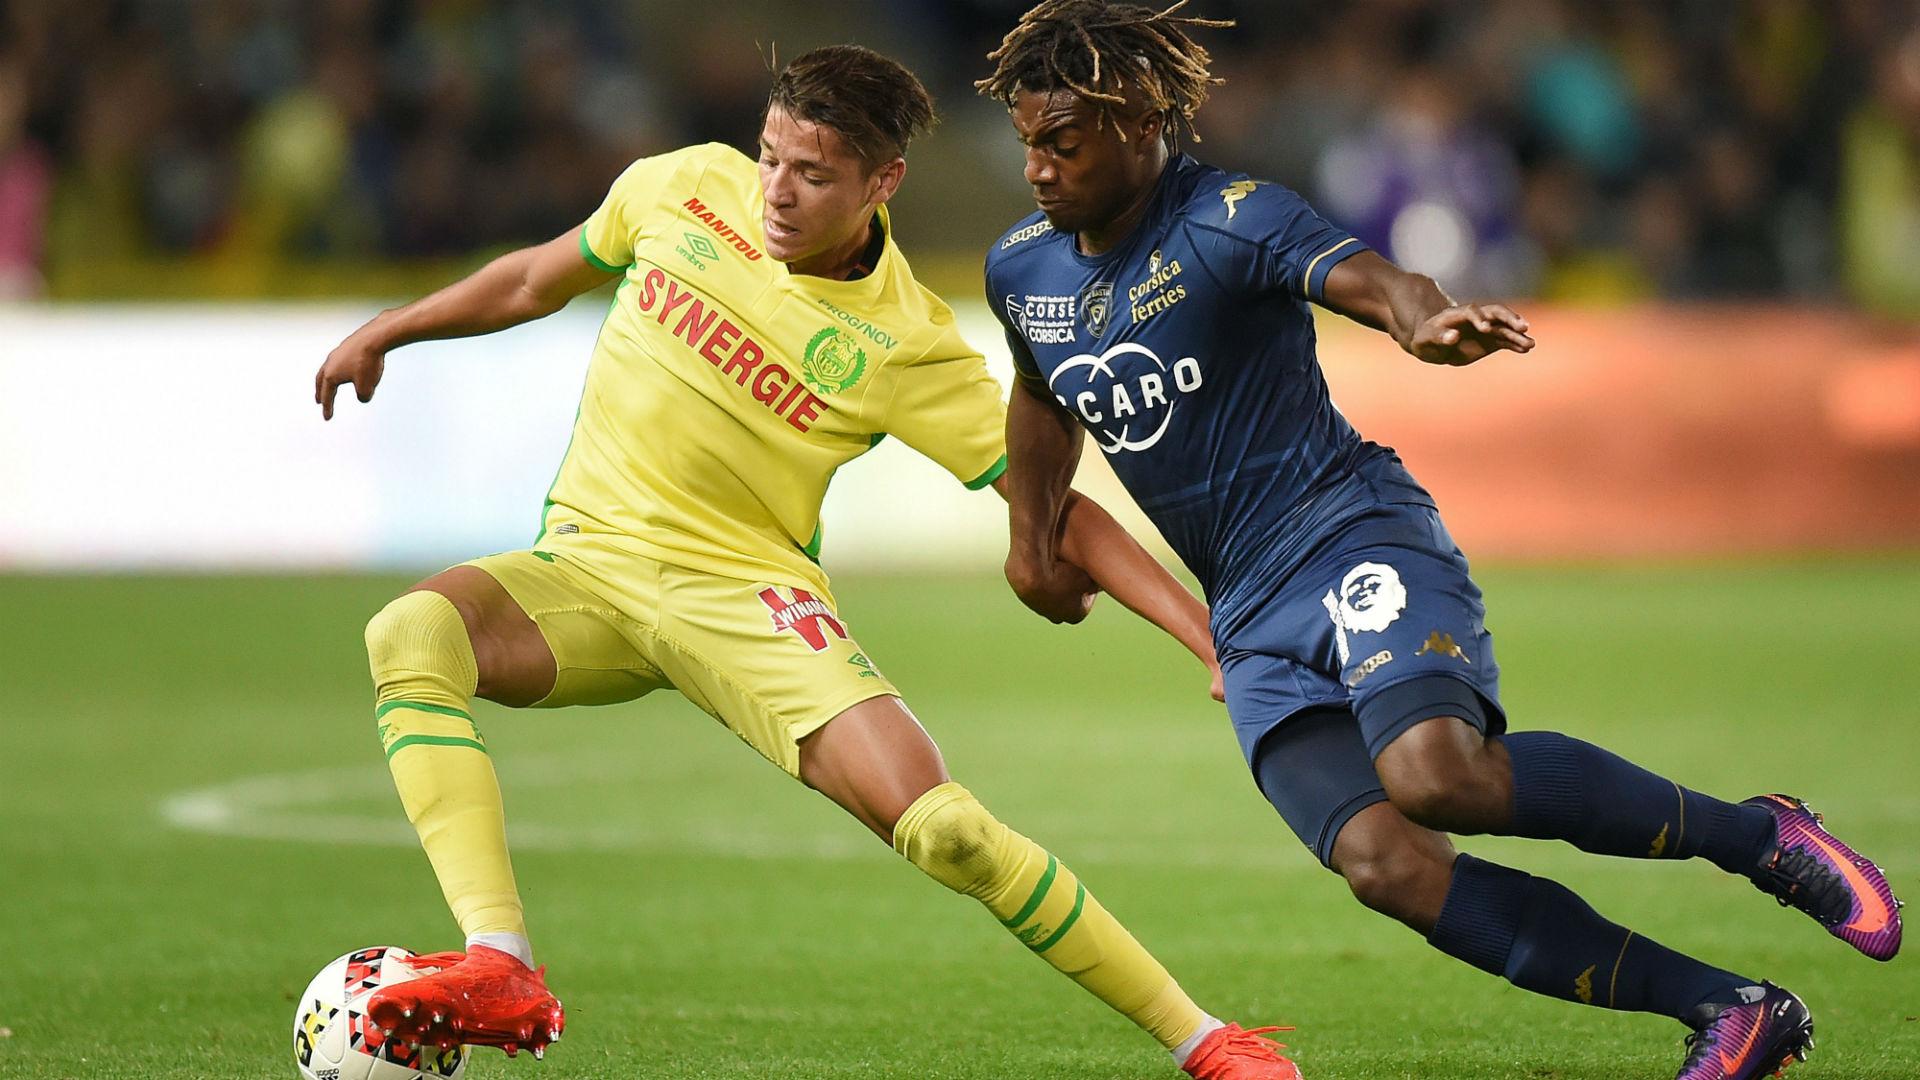 Le FC Nantes prolonge sa pépite — Officiel